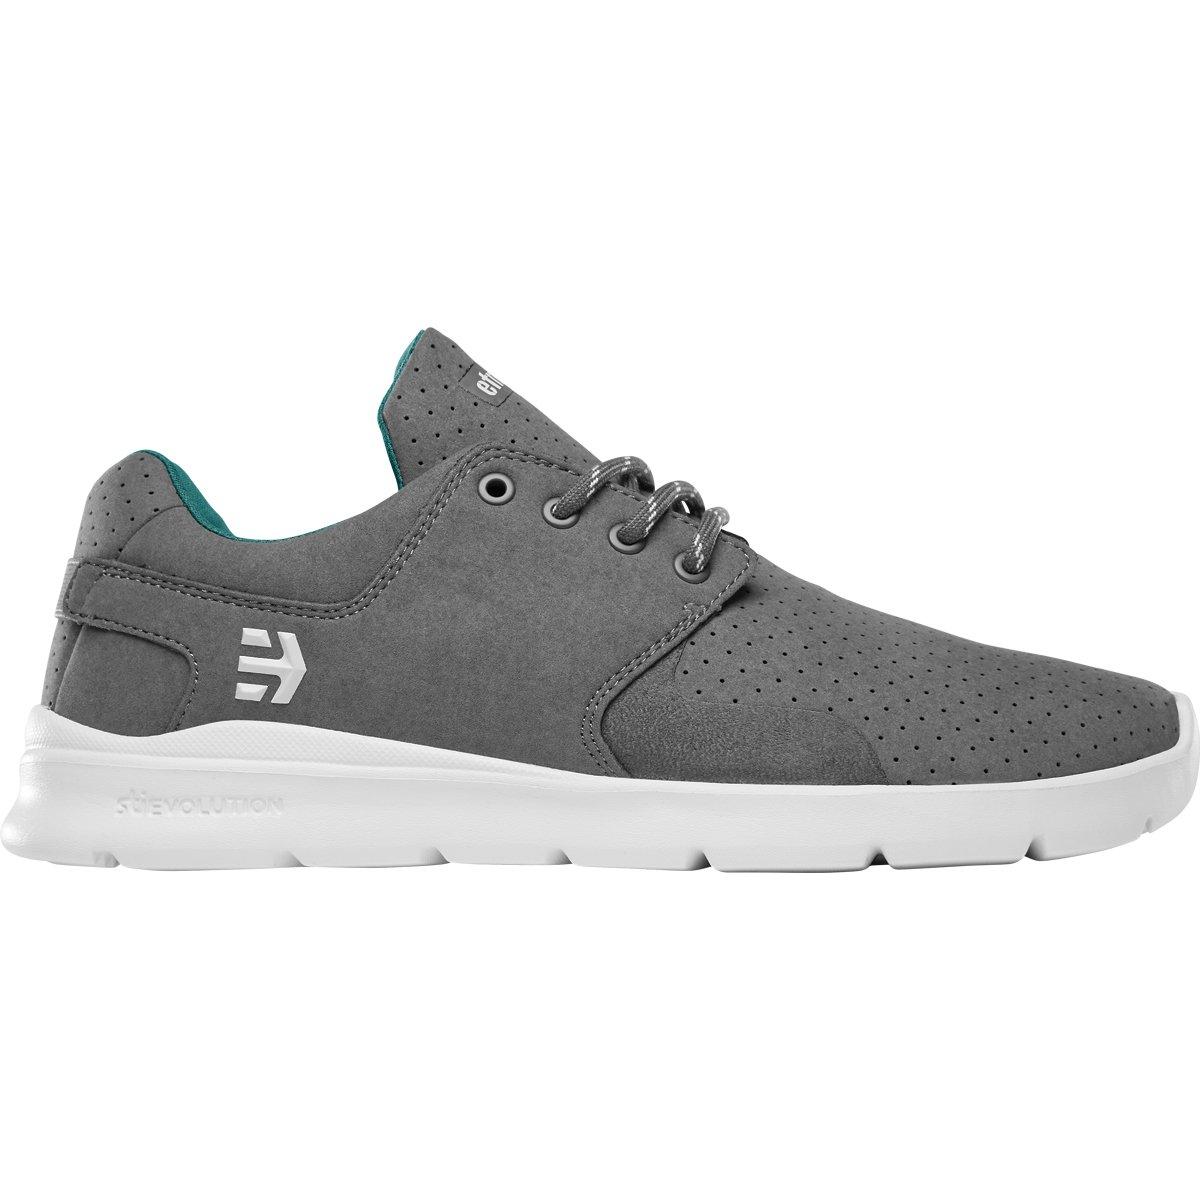 Etnies Mens Men's Scout XT Skate Shoe 11 D(M) US|Dark Grey/White